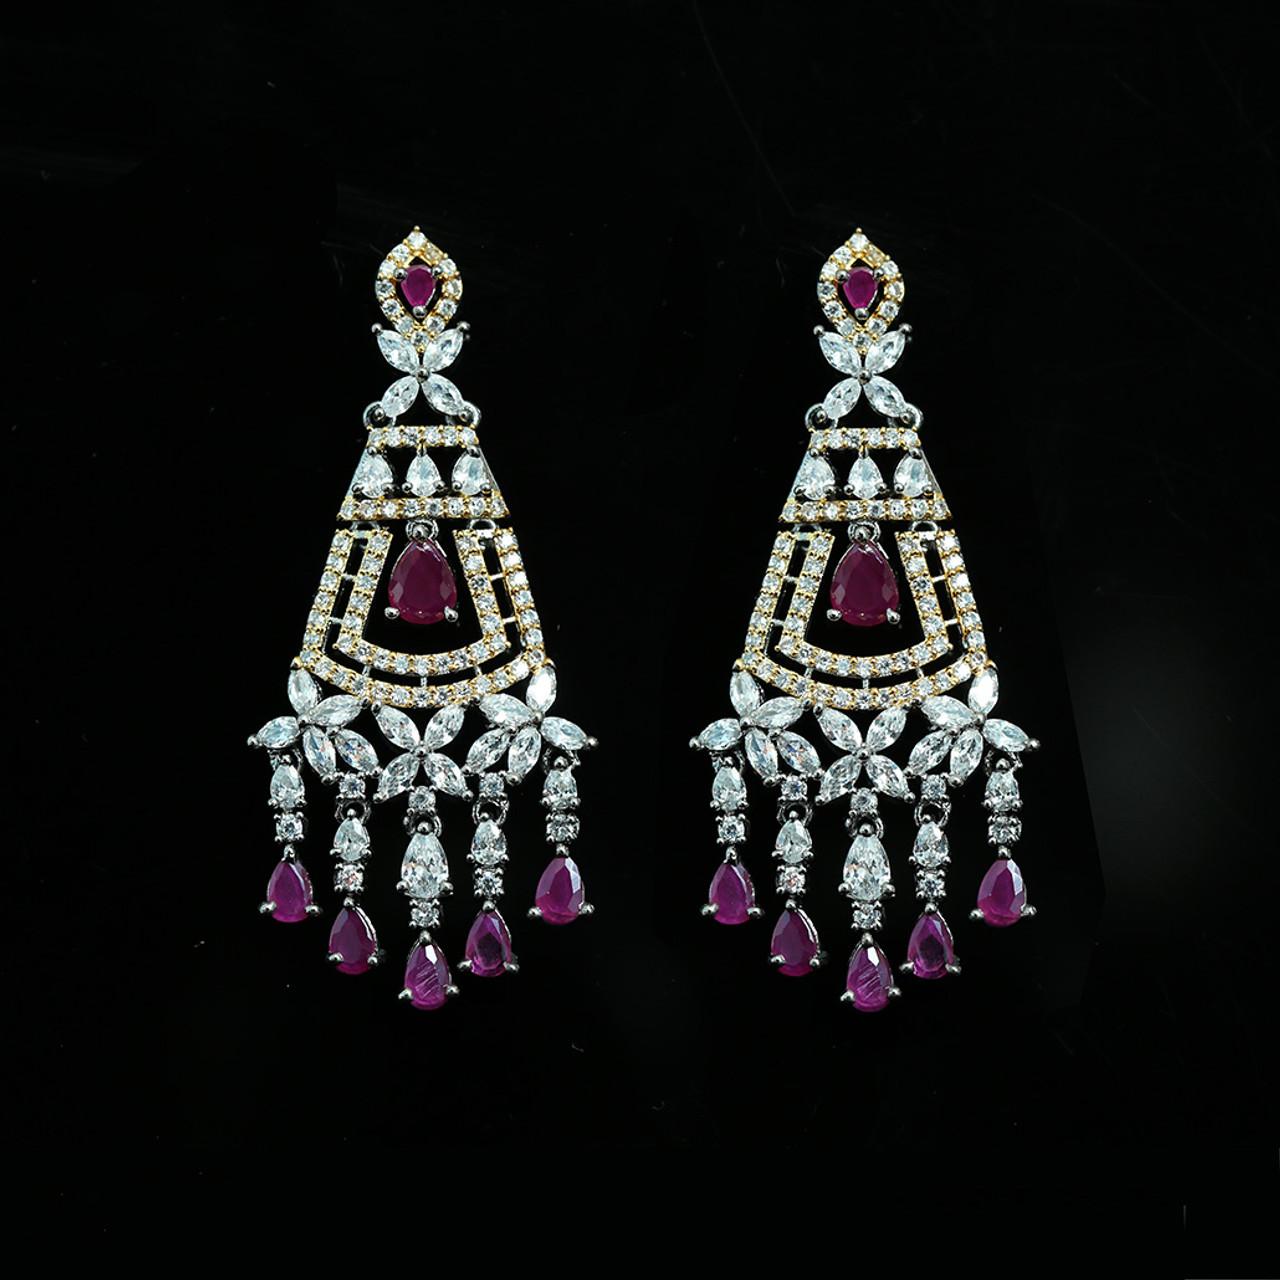 Indian Ethnic Antique Gold Plated Ruby Pink Zirconia Long Dangle Earrings Wedding Gift